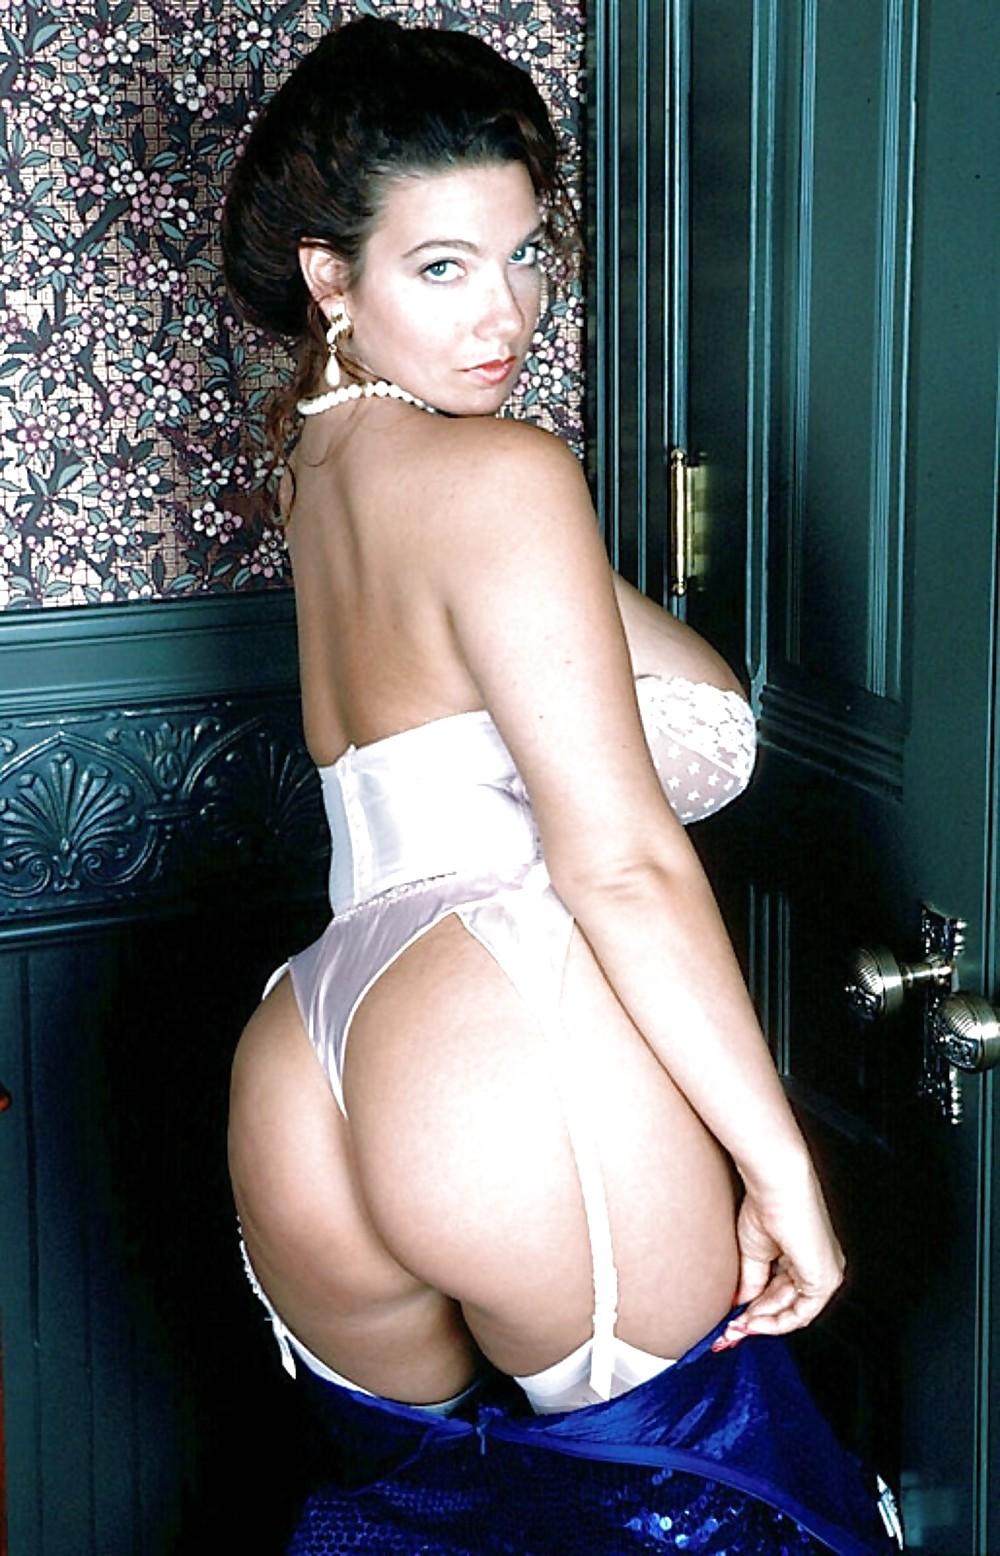 Pale White Girl Big Tits